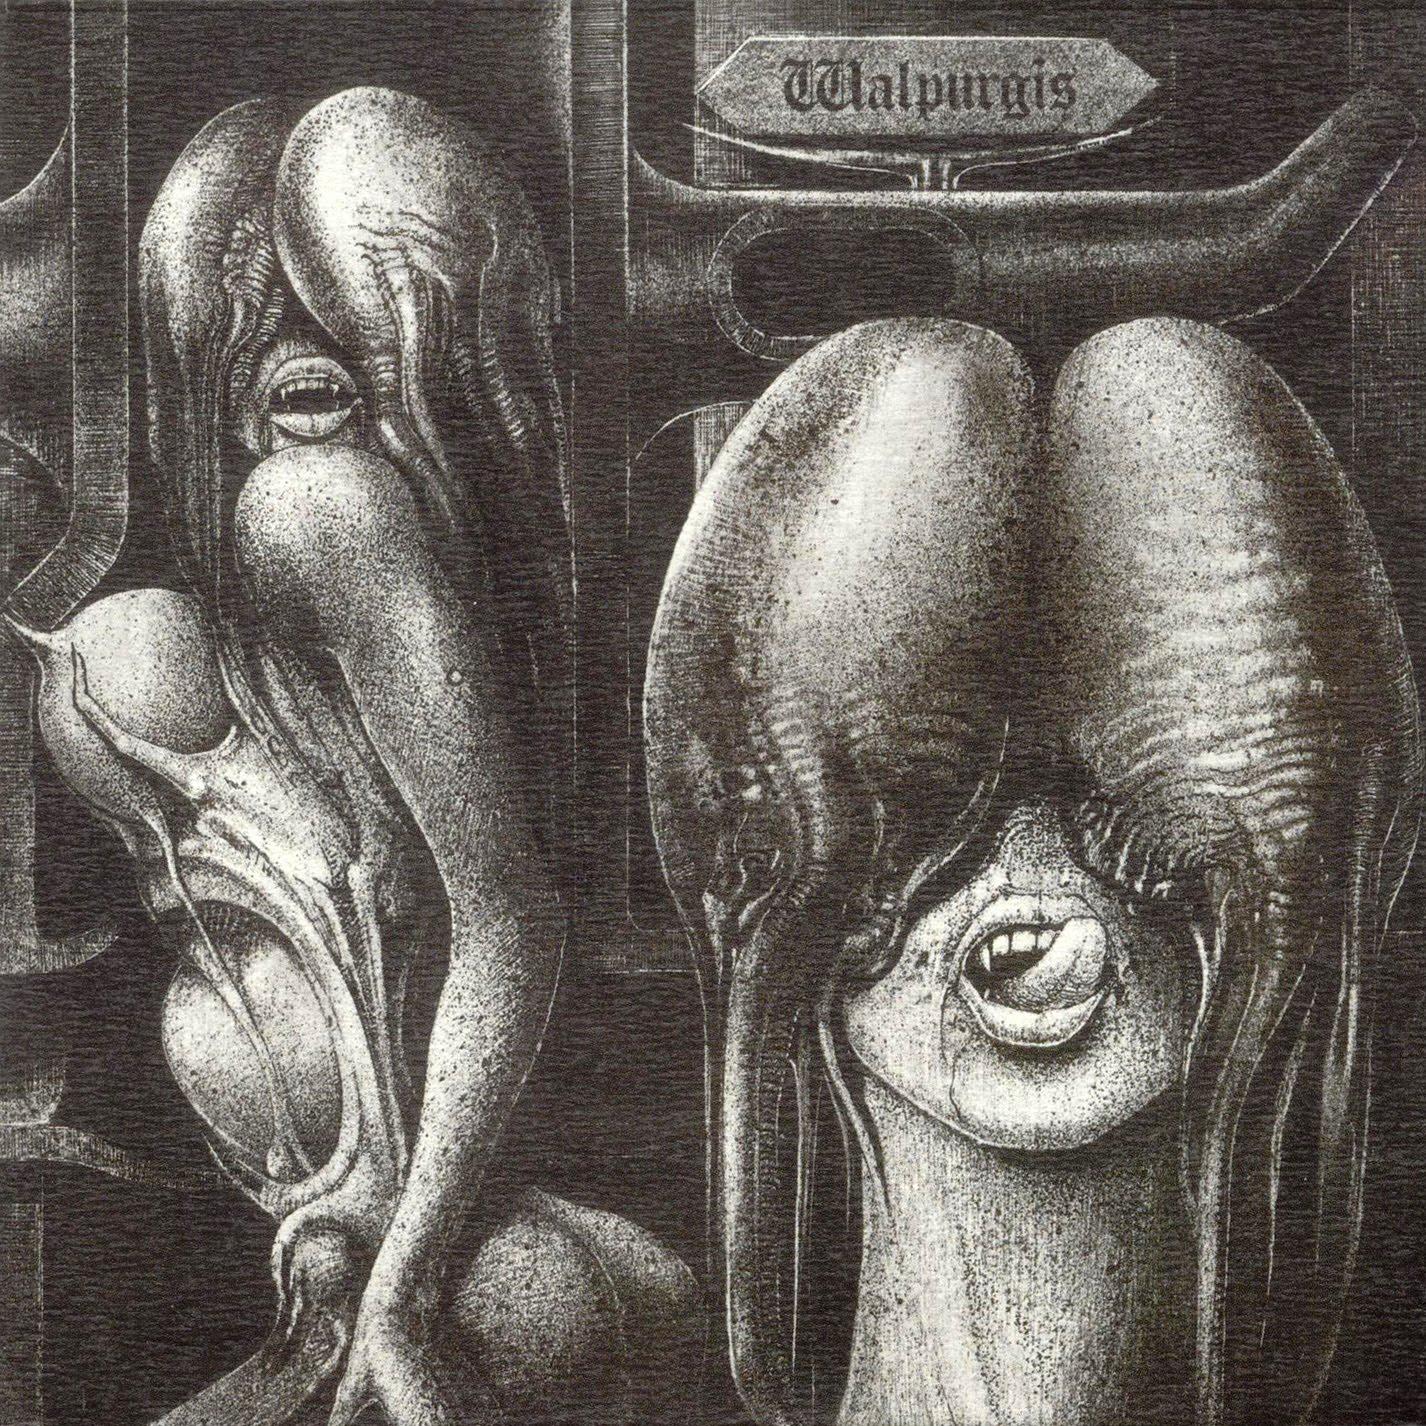 The Shiver - Walpurgis (1969)